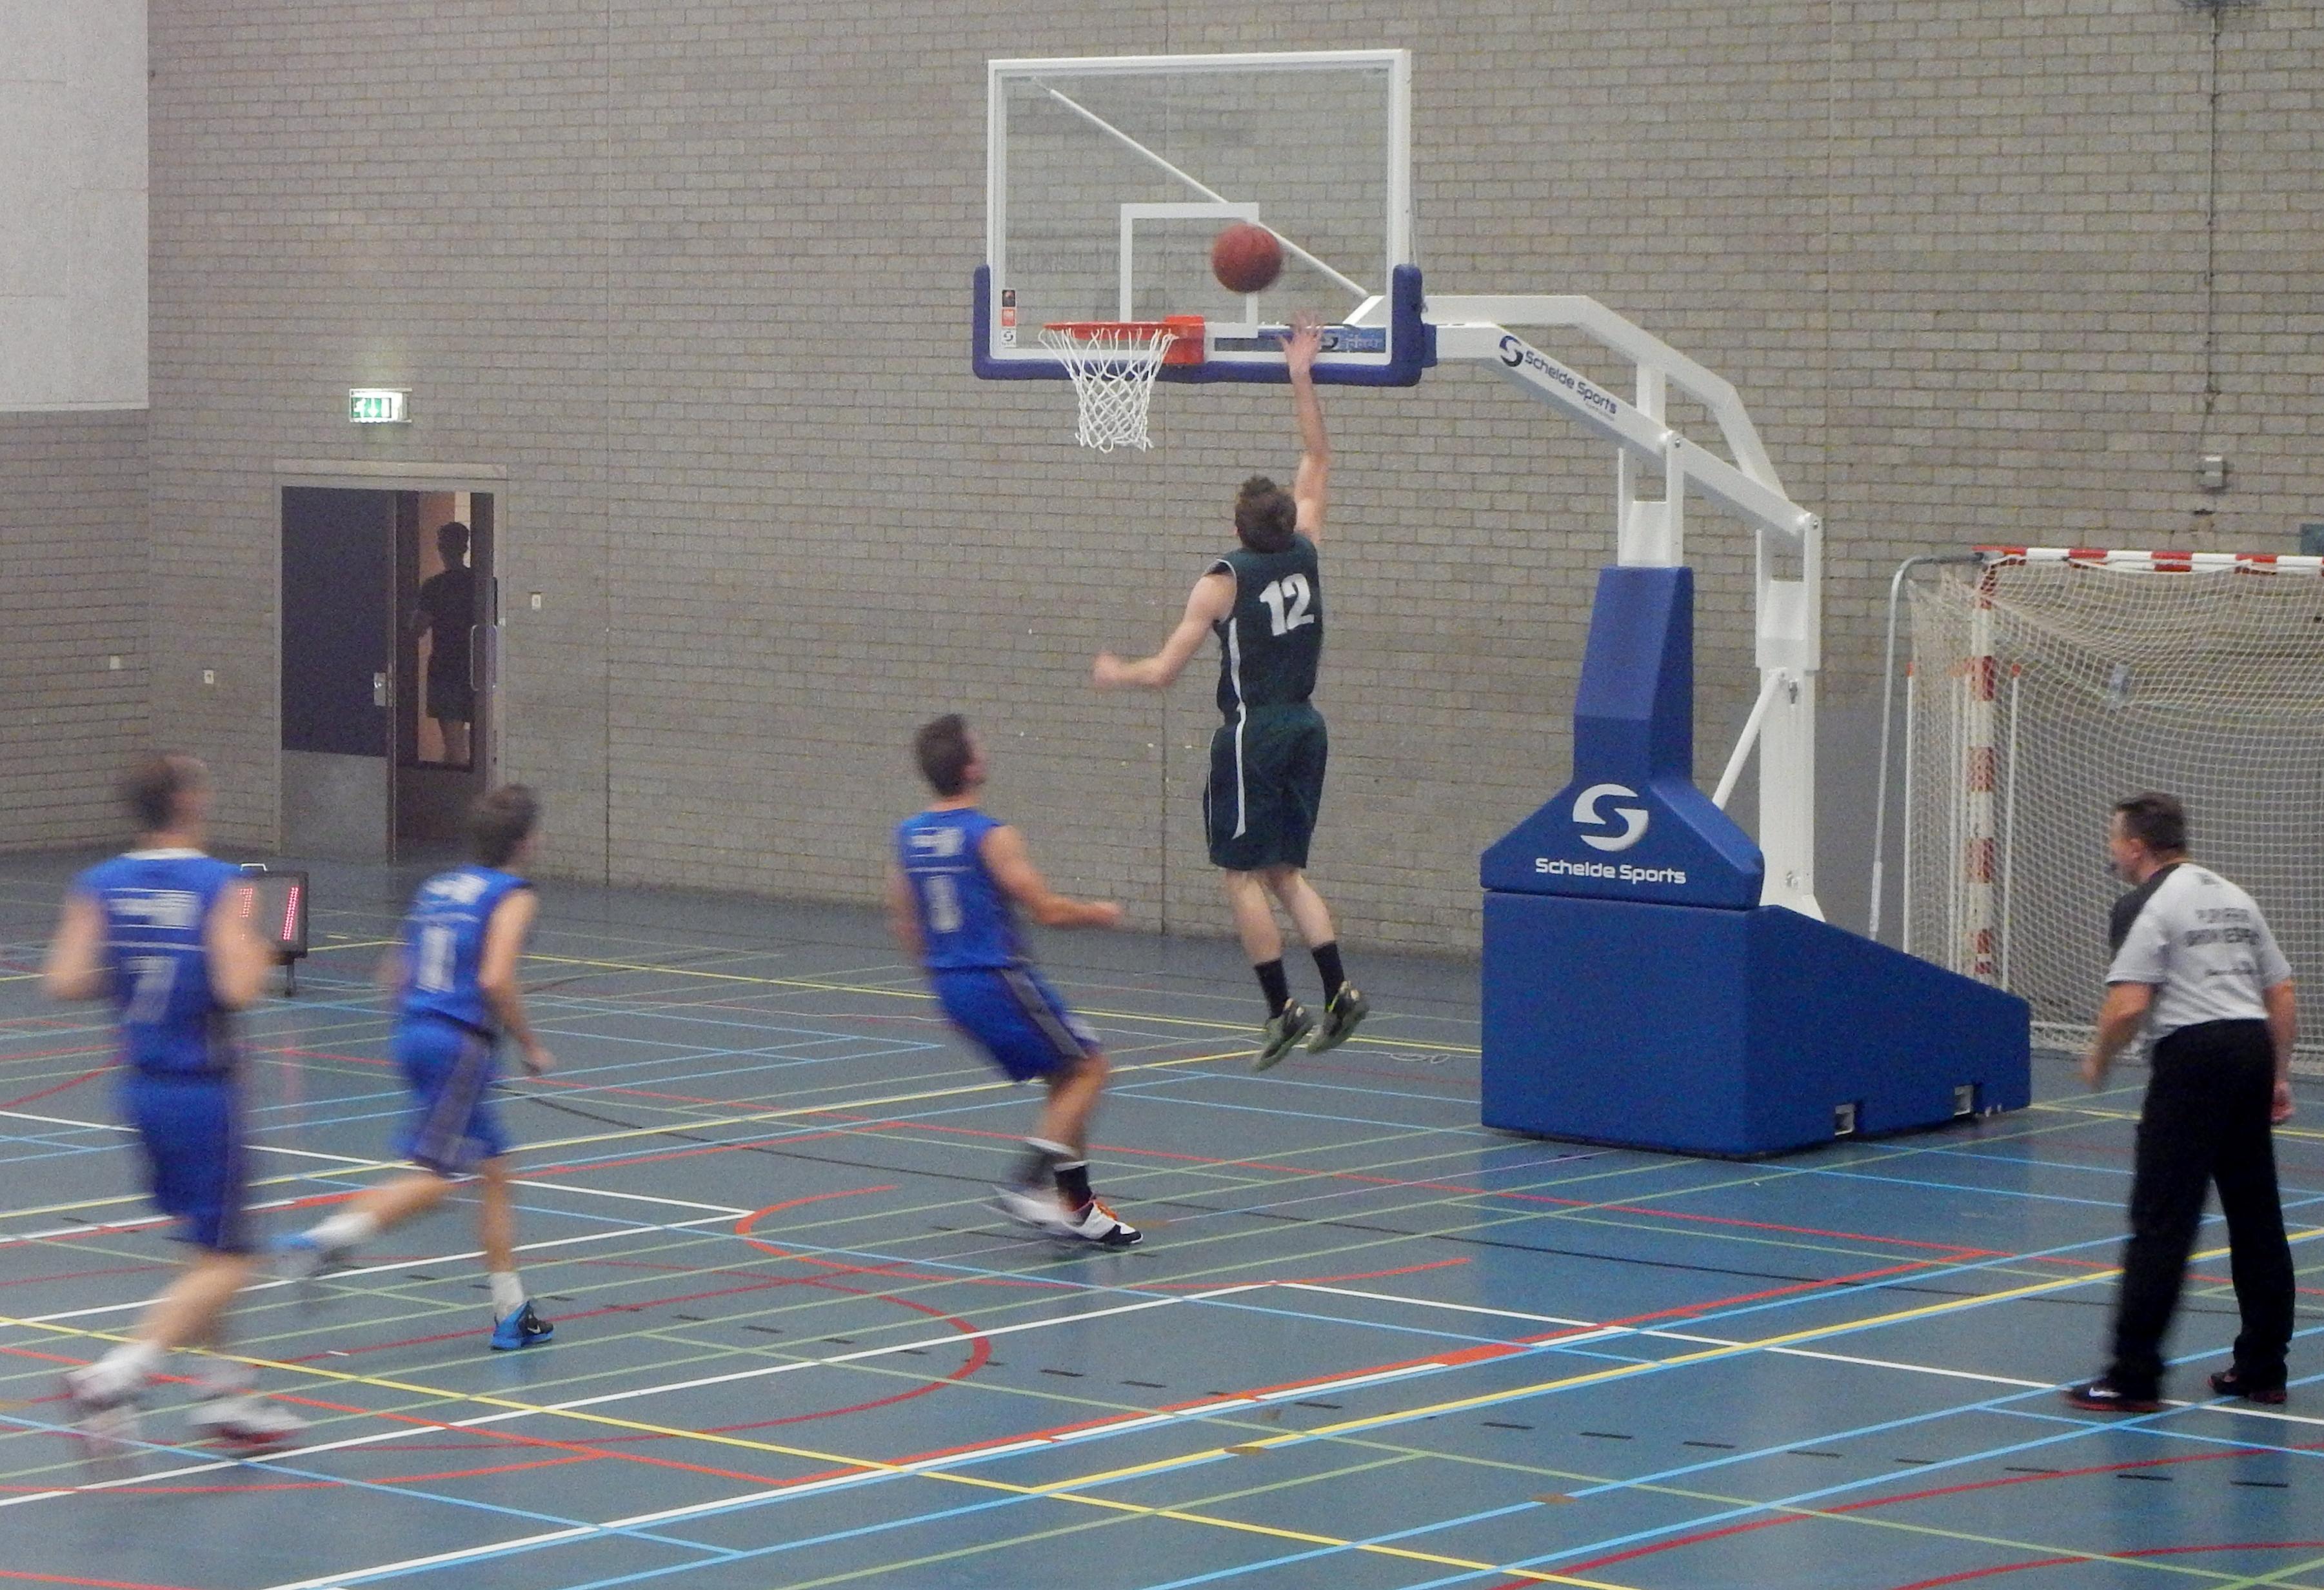 Basketbal EBV Baros tegen Vlijmscherp